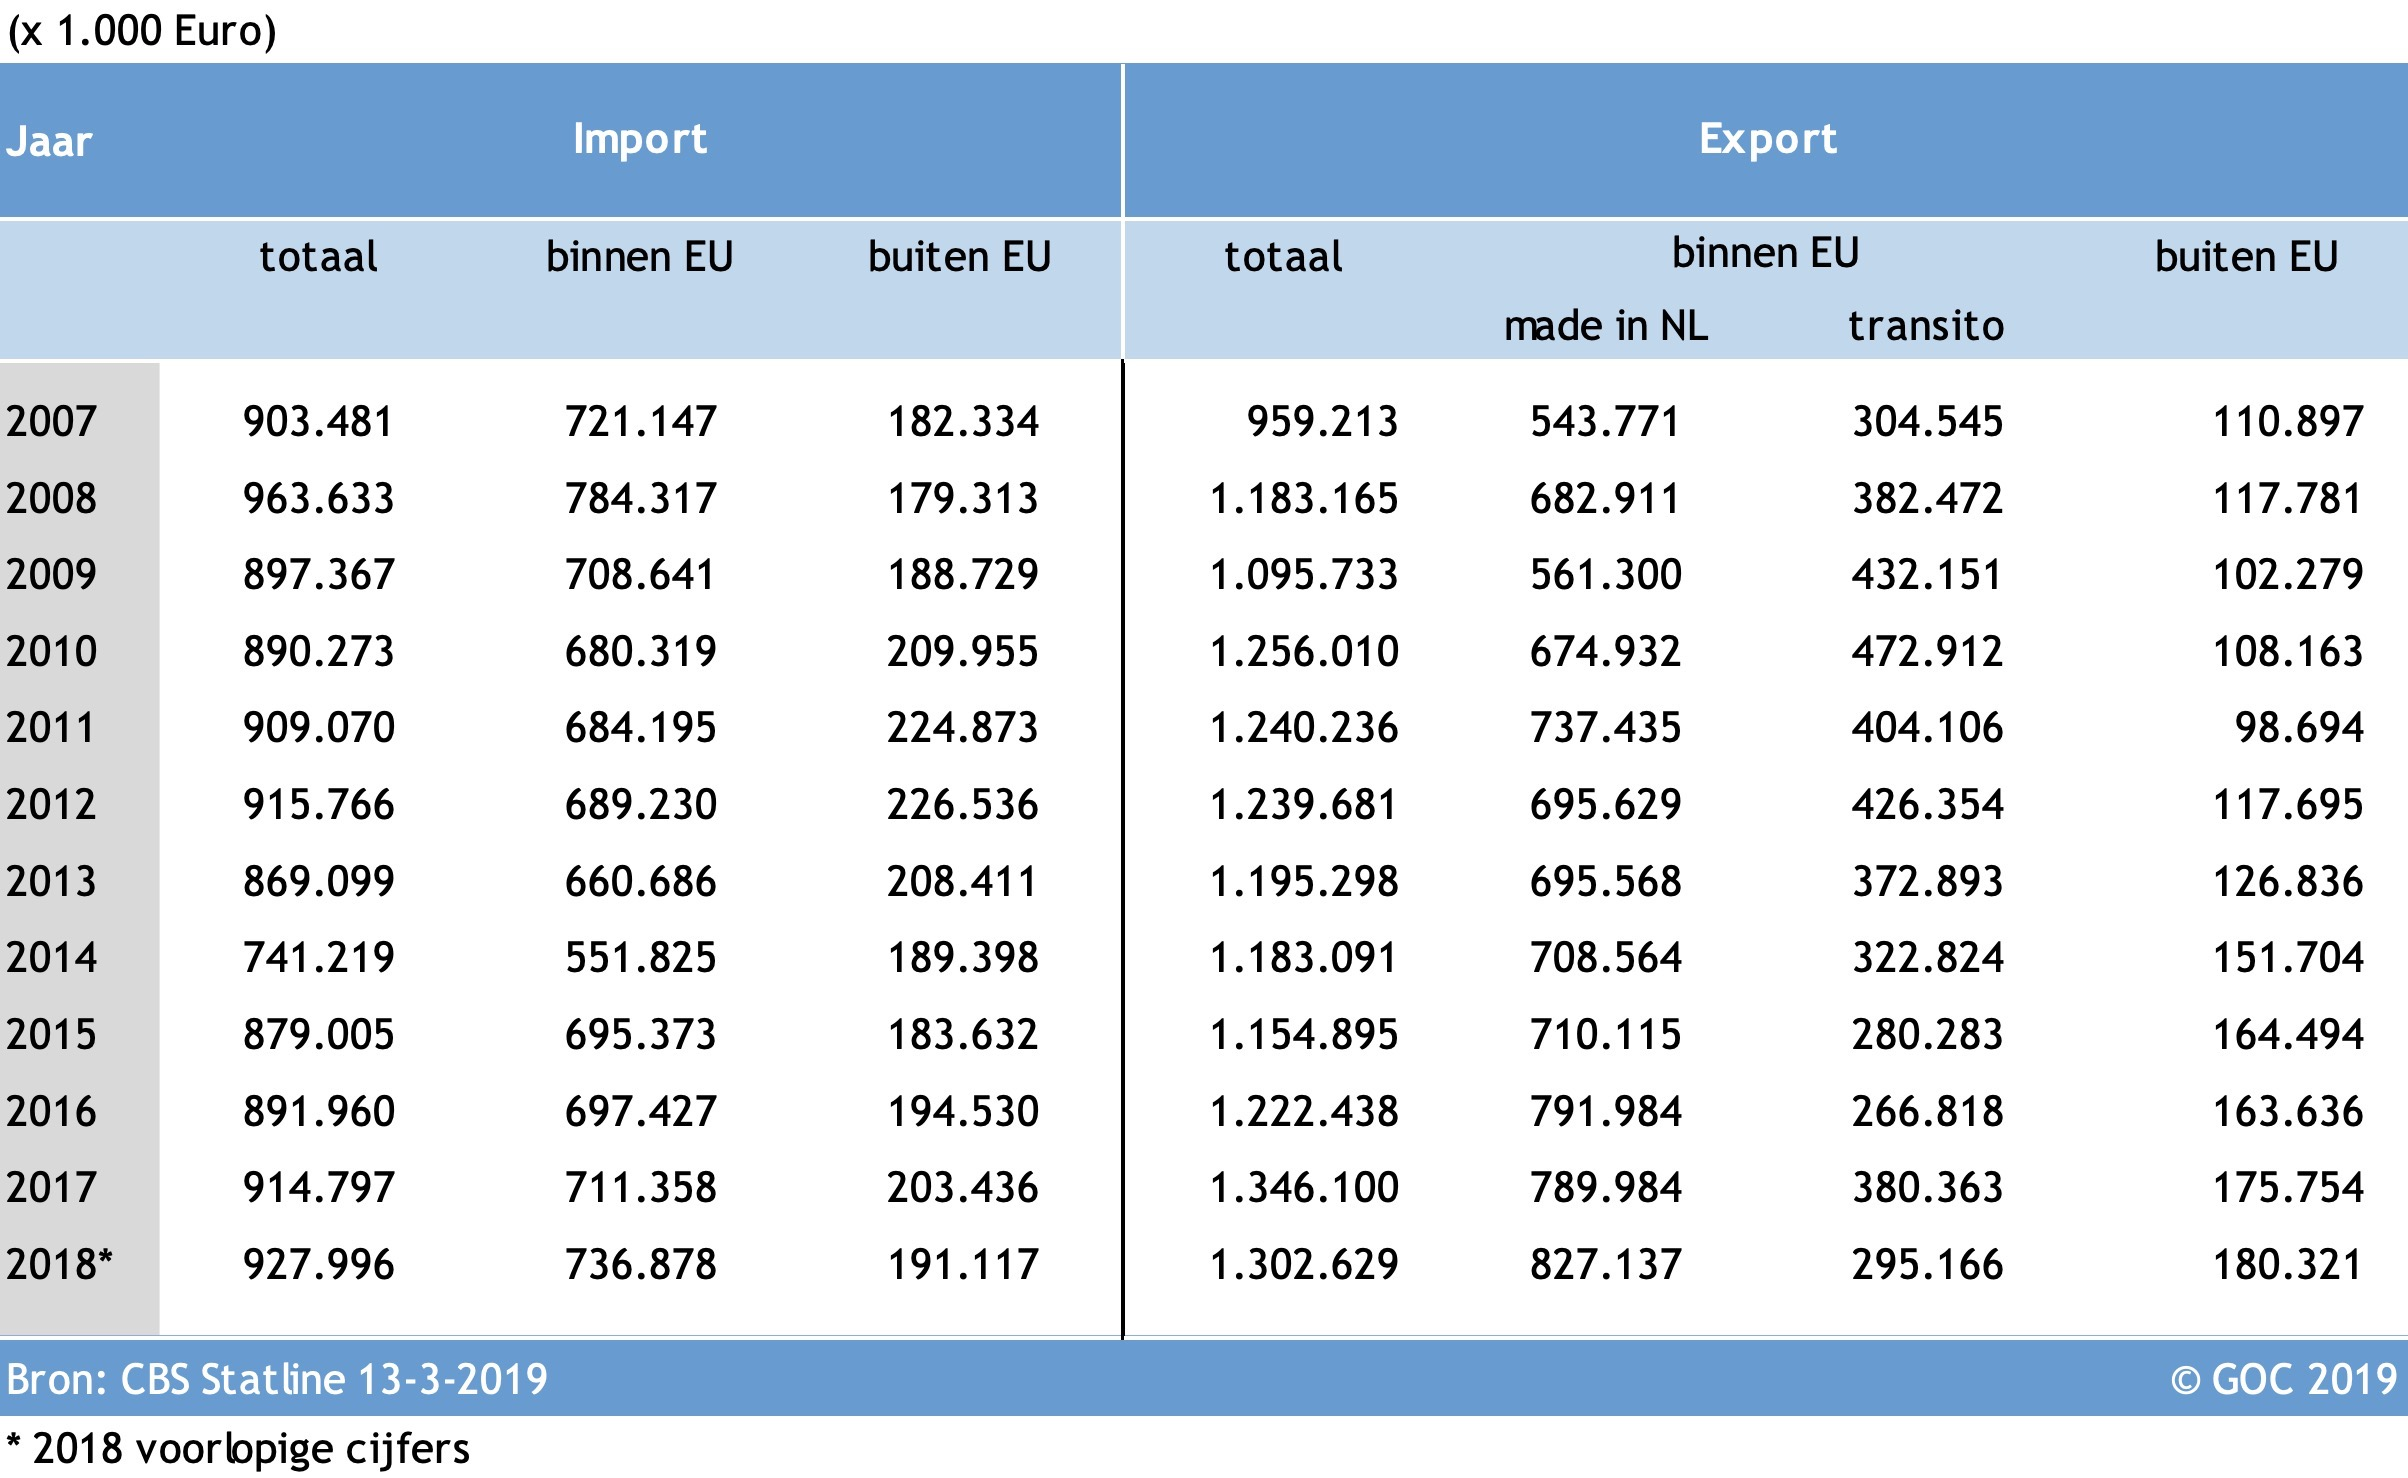 import-export-goc-2018